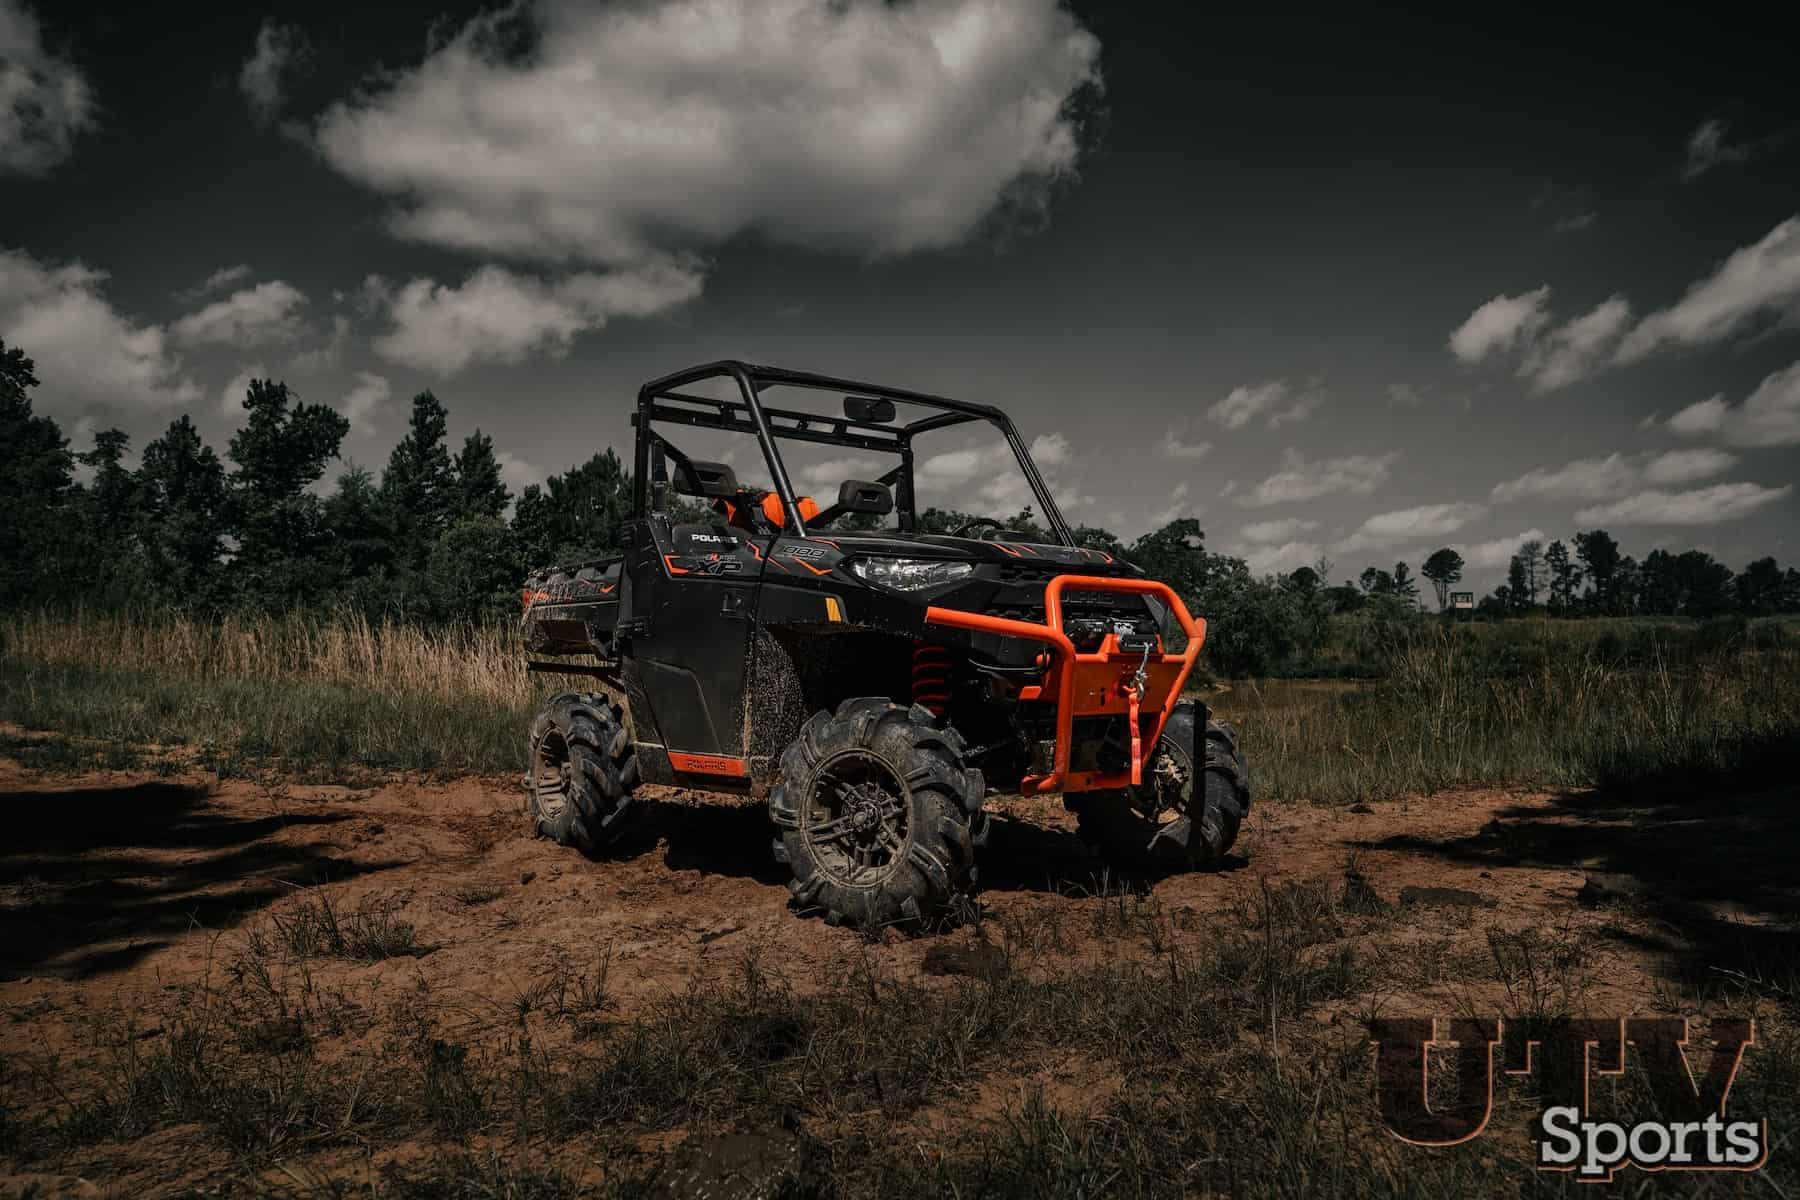 2019-ranger-xp-1000-eps-highlifter-edition_SIX6344_01188